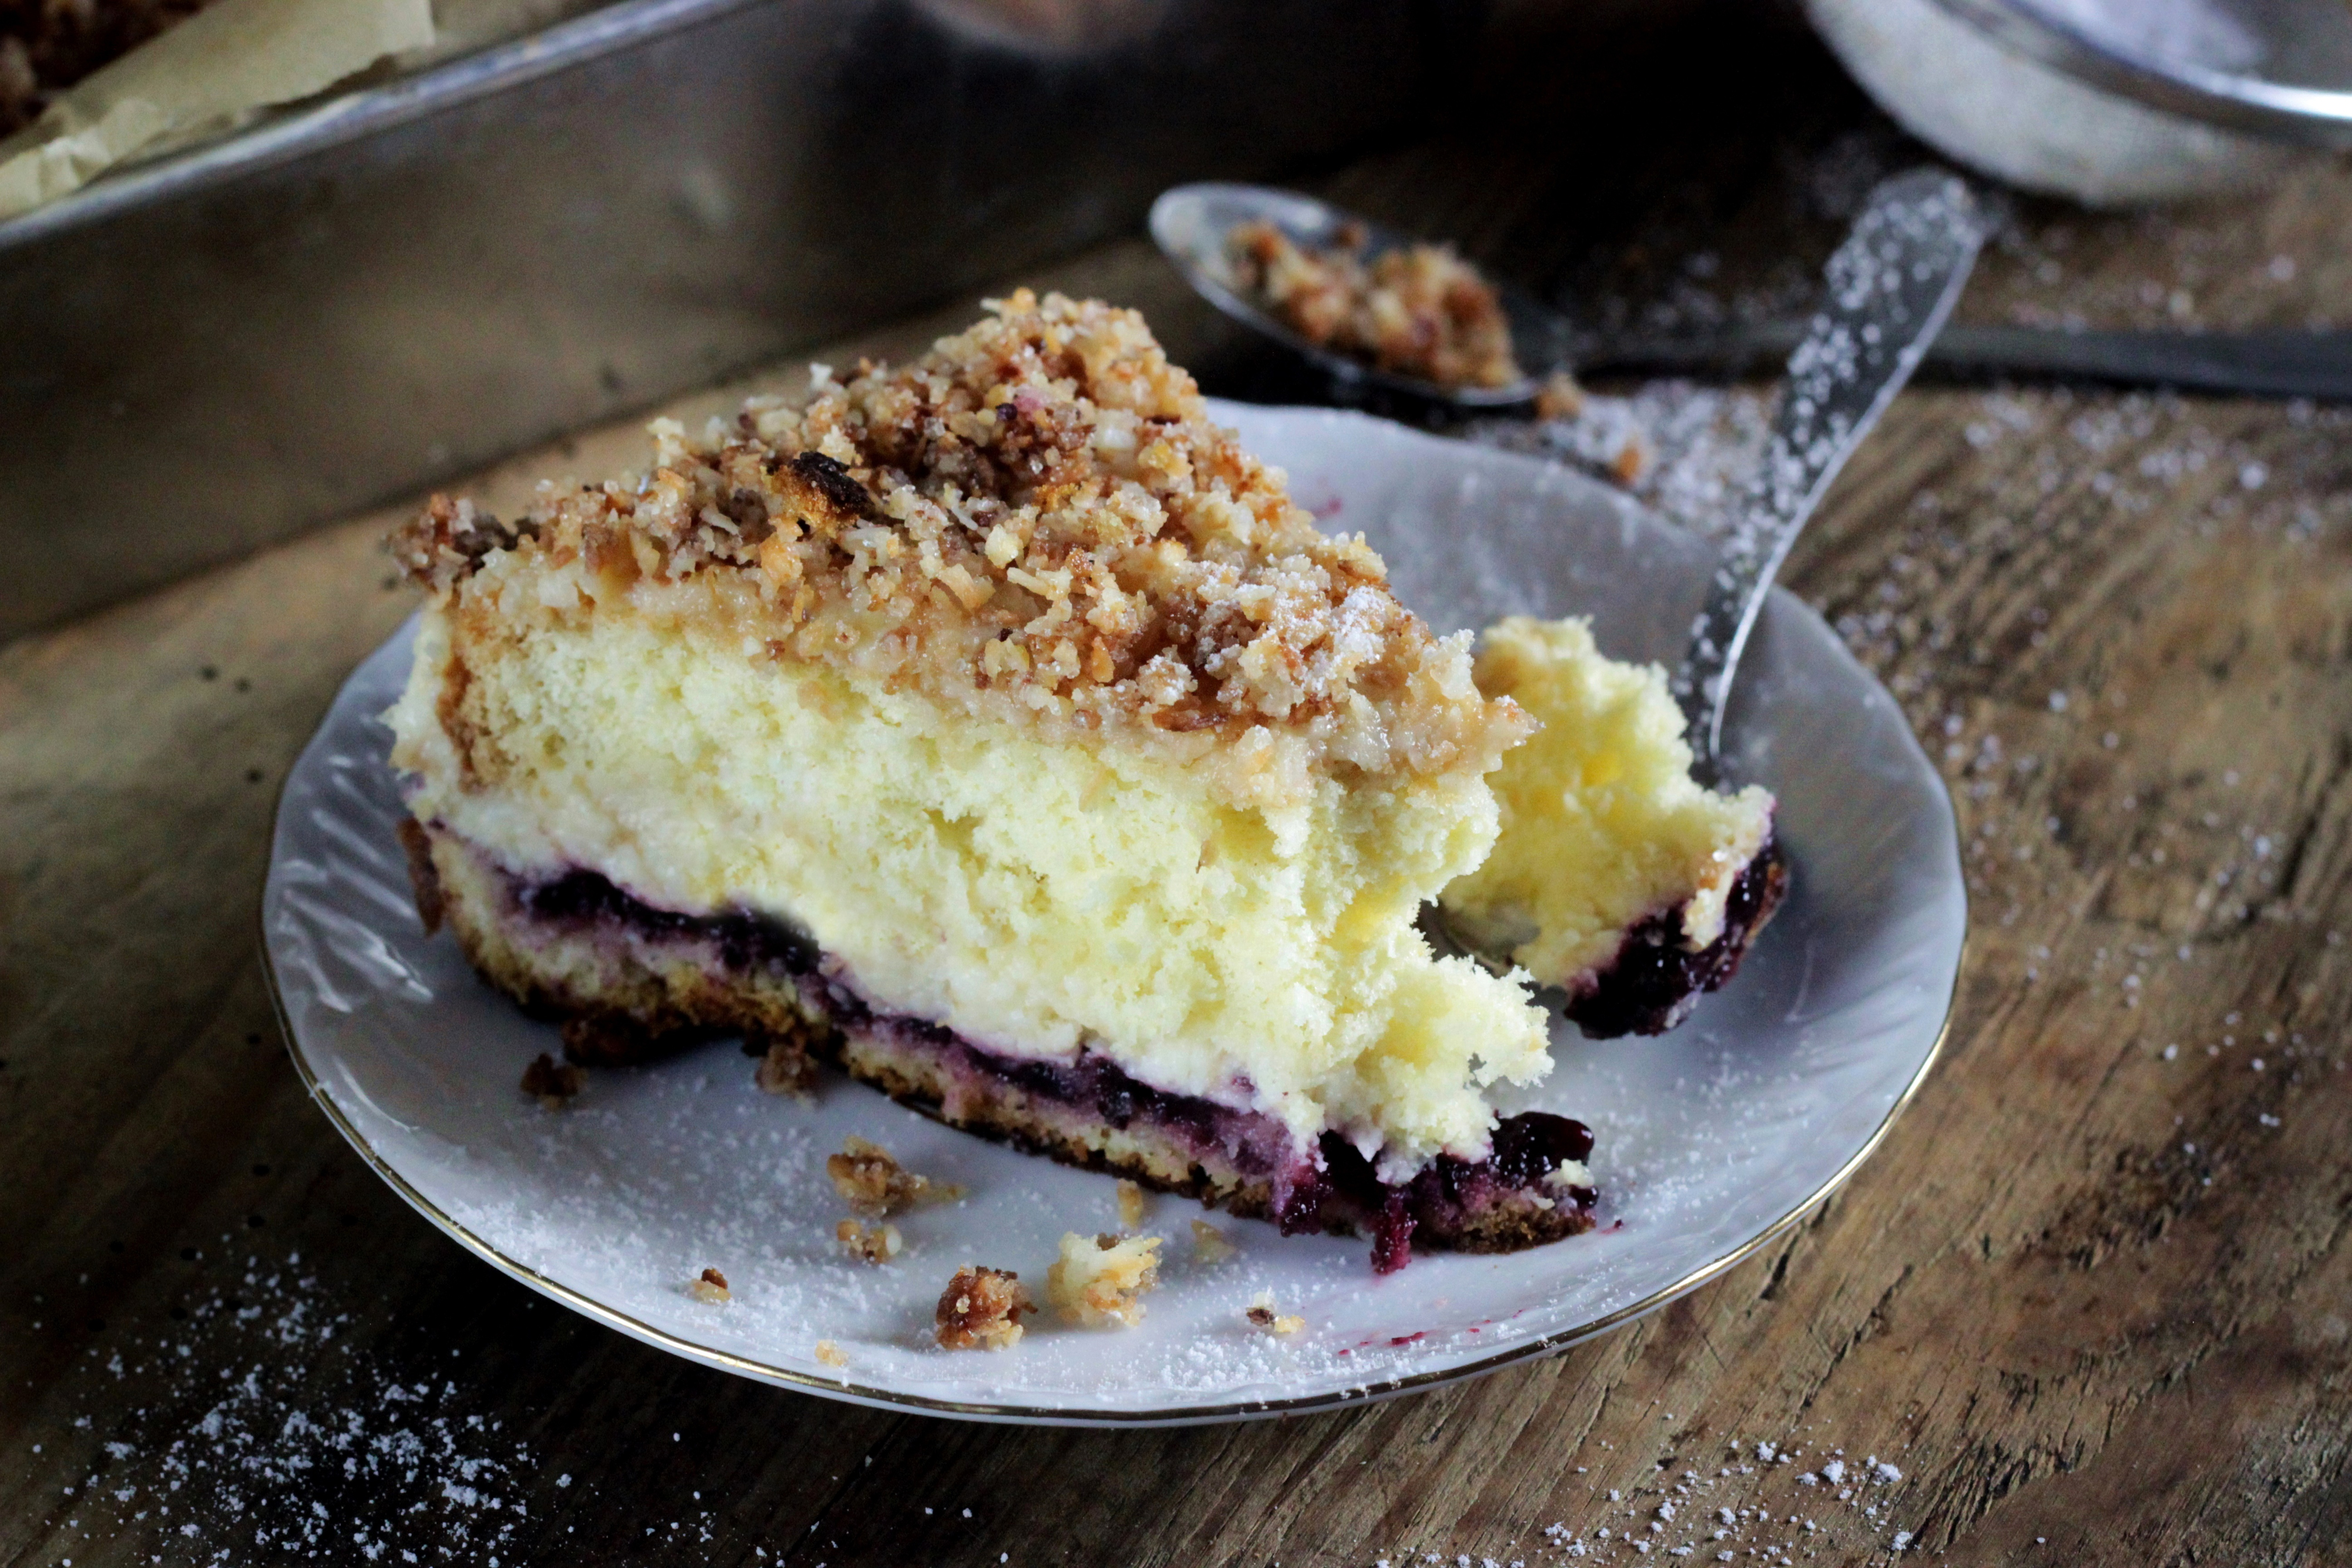 labedzi-puch-ciasto-ciasto-kokosowe-ciasto-budynniowe-pyszne-ciasta-tanie-ciasta-blog-z-ciastami-ostra-na-slodko-3xx